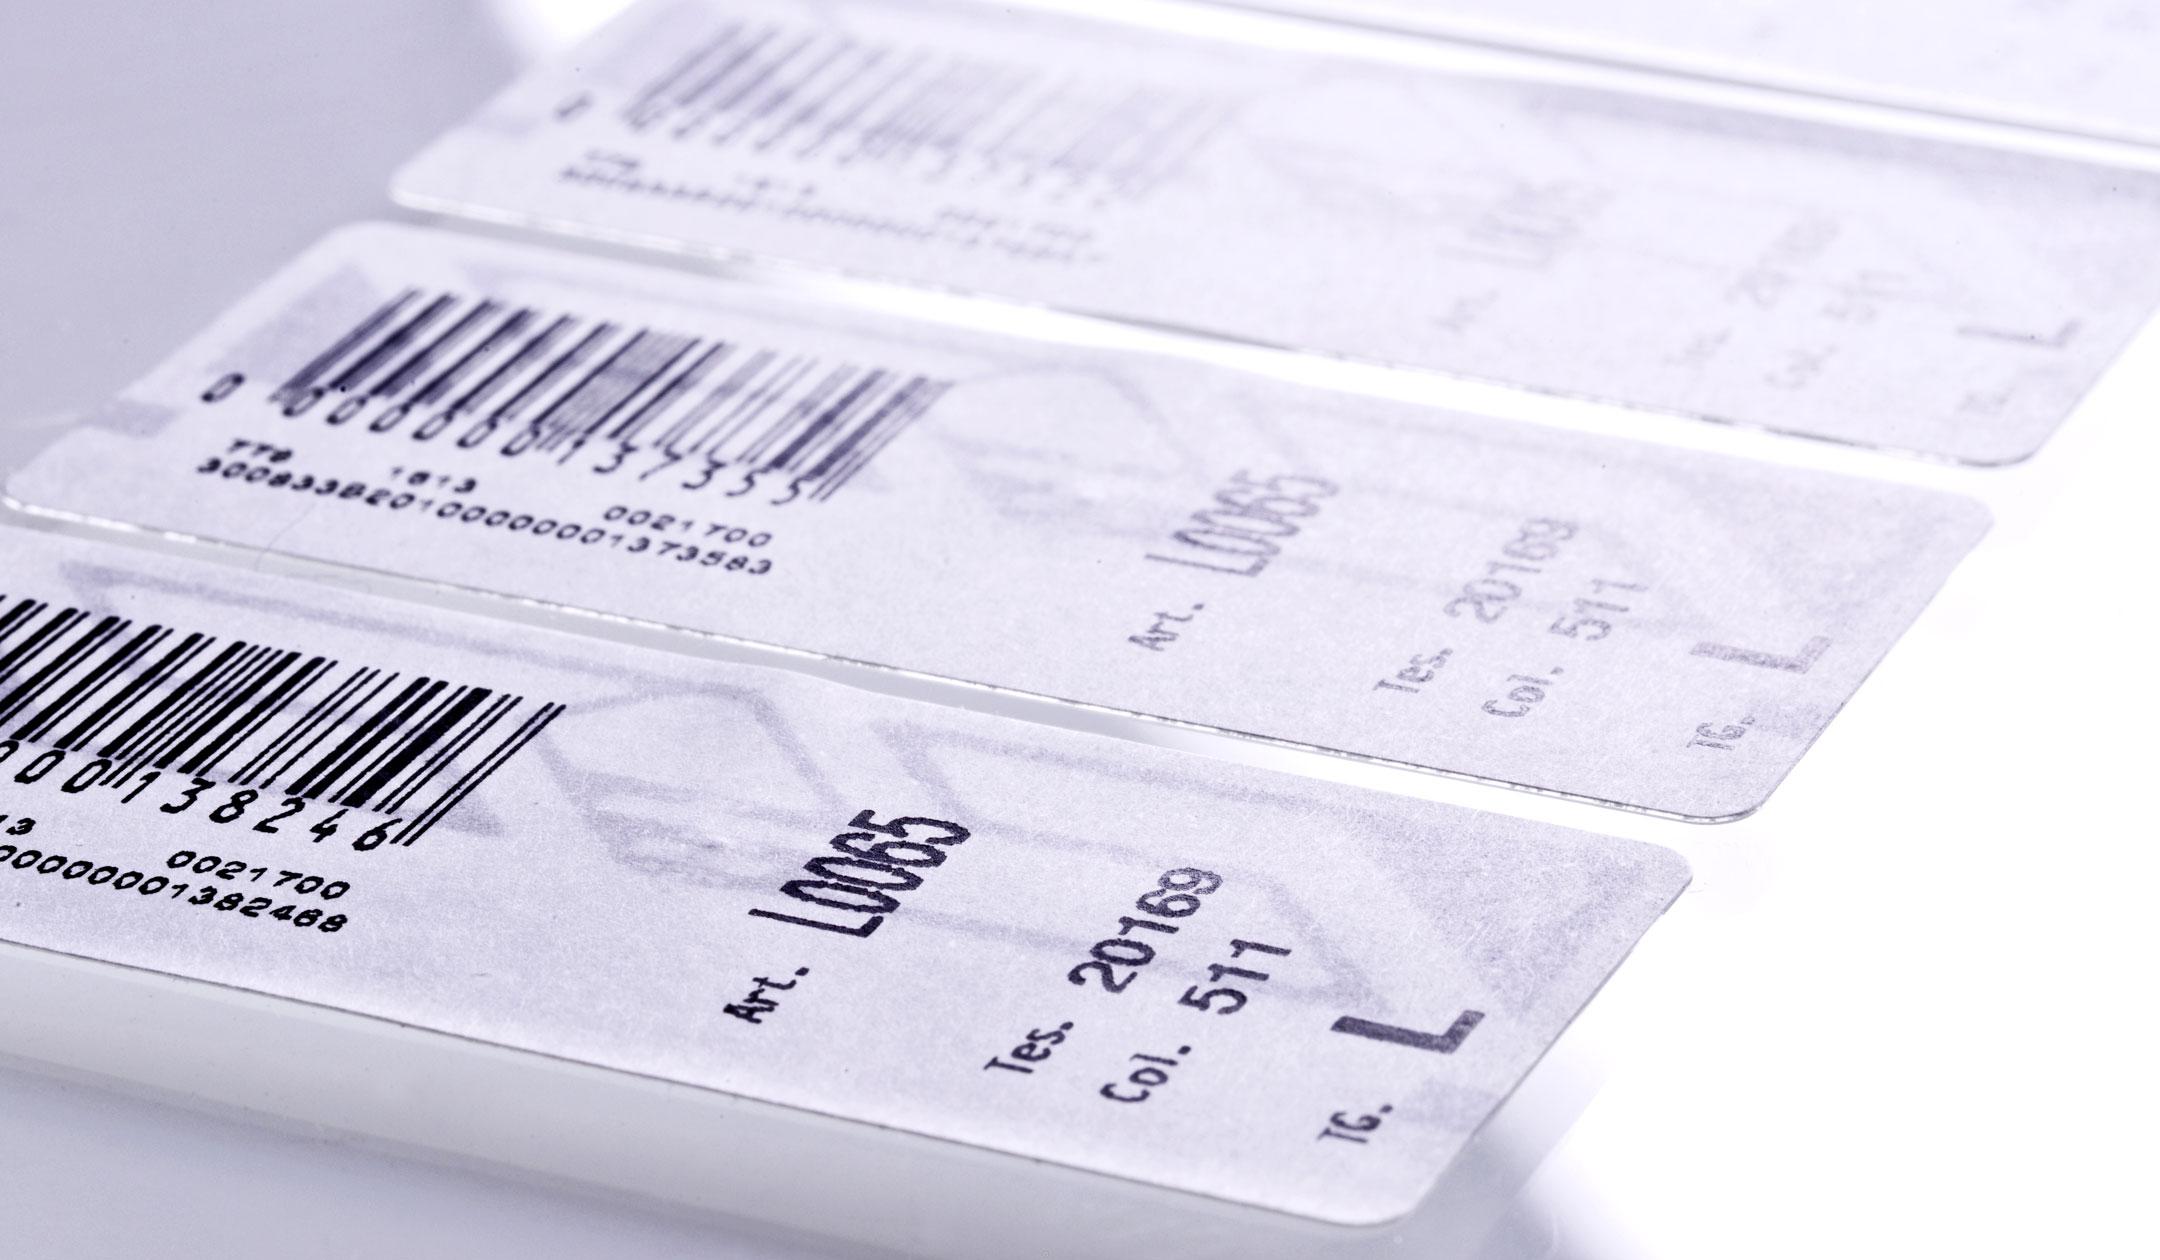 cadica_innovation_nest_barcode